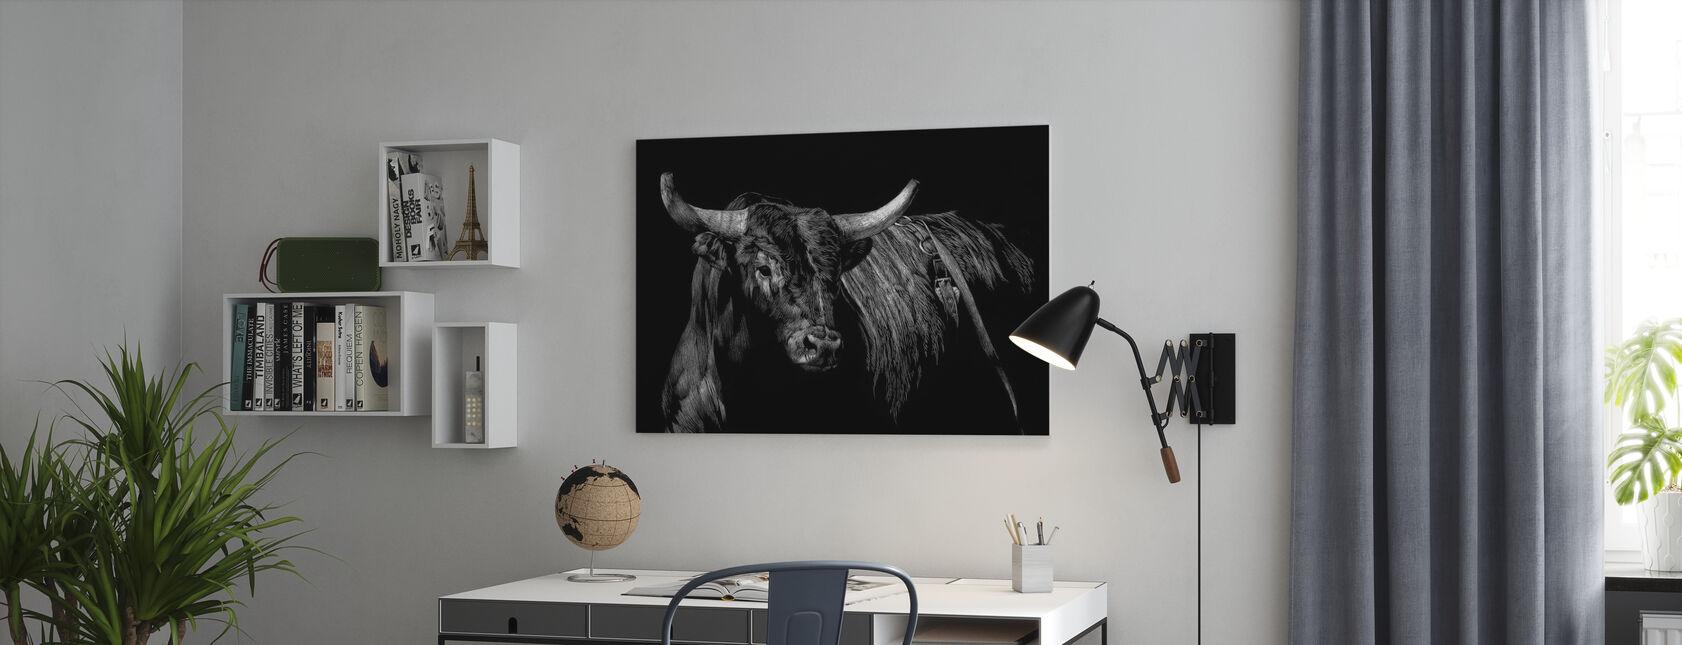 Brindle Rodeo Bull - Canvastaulu - Toimisto